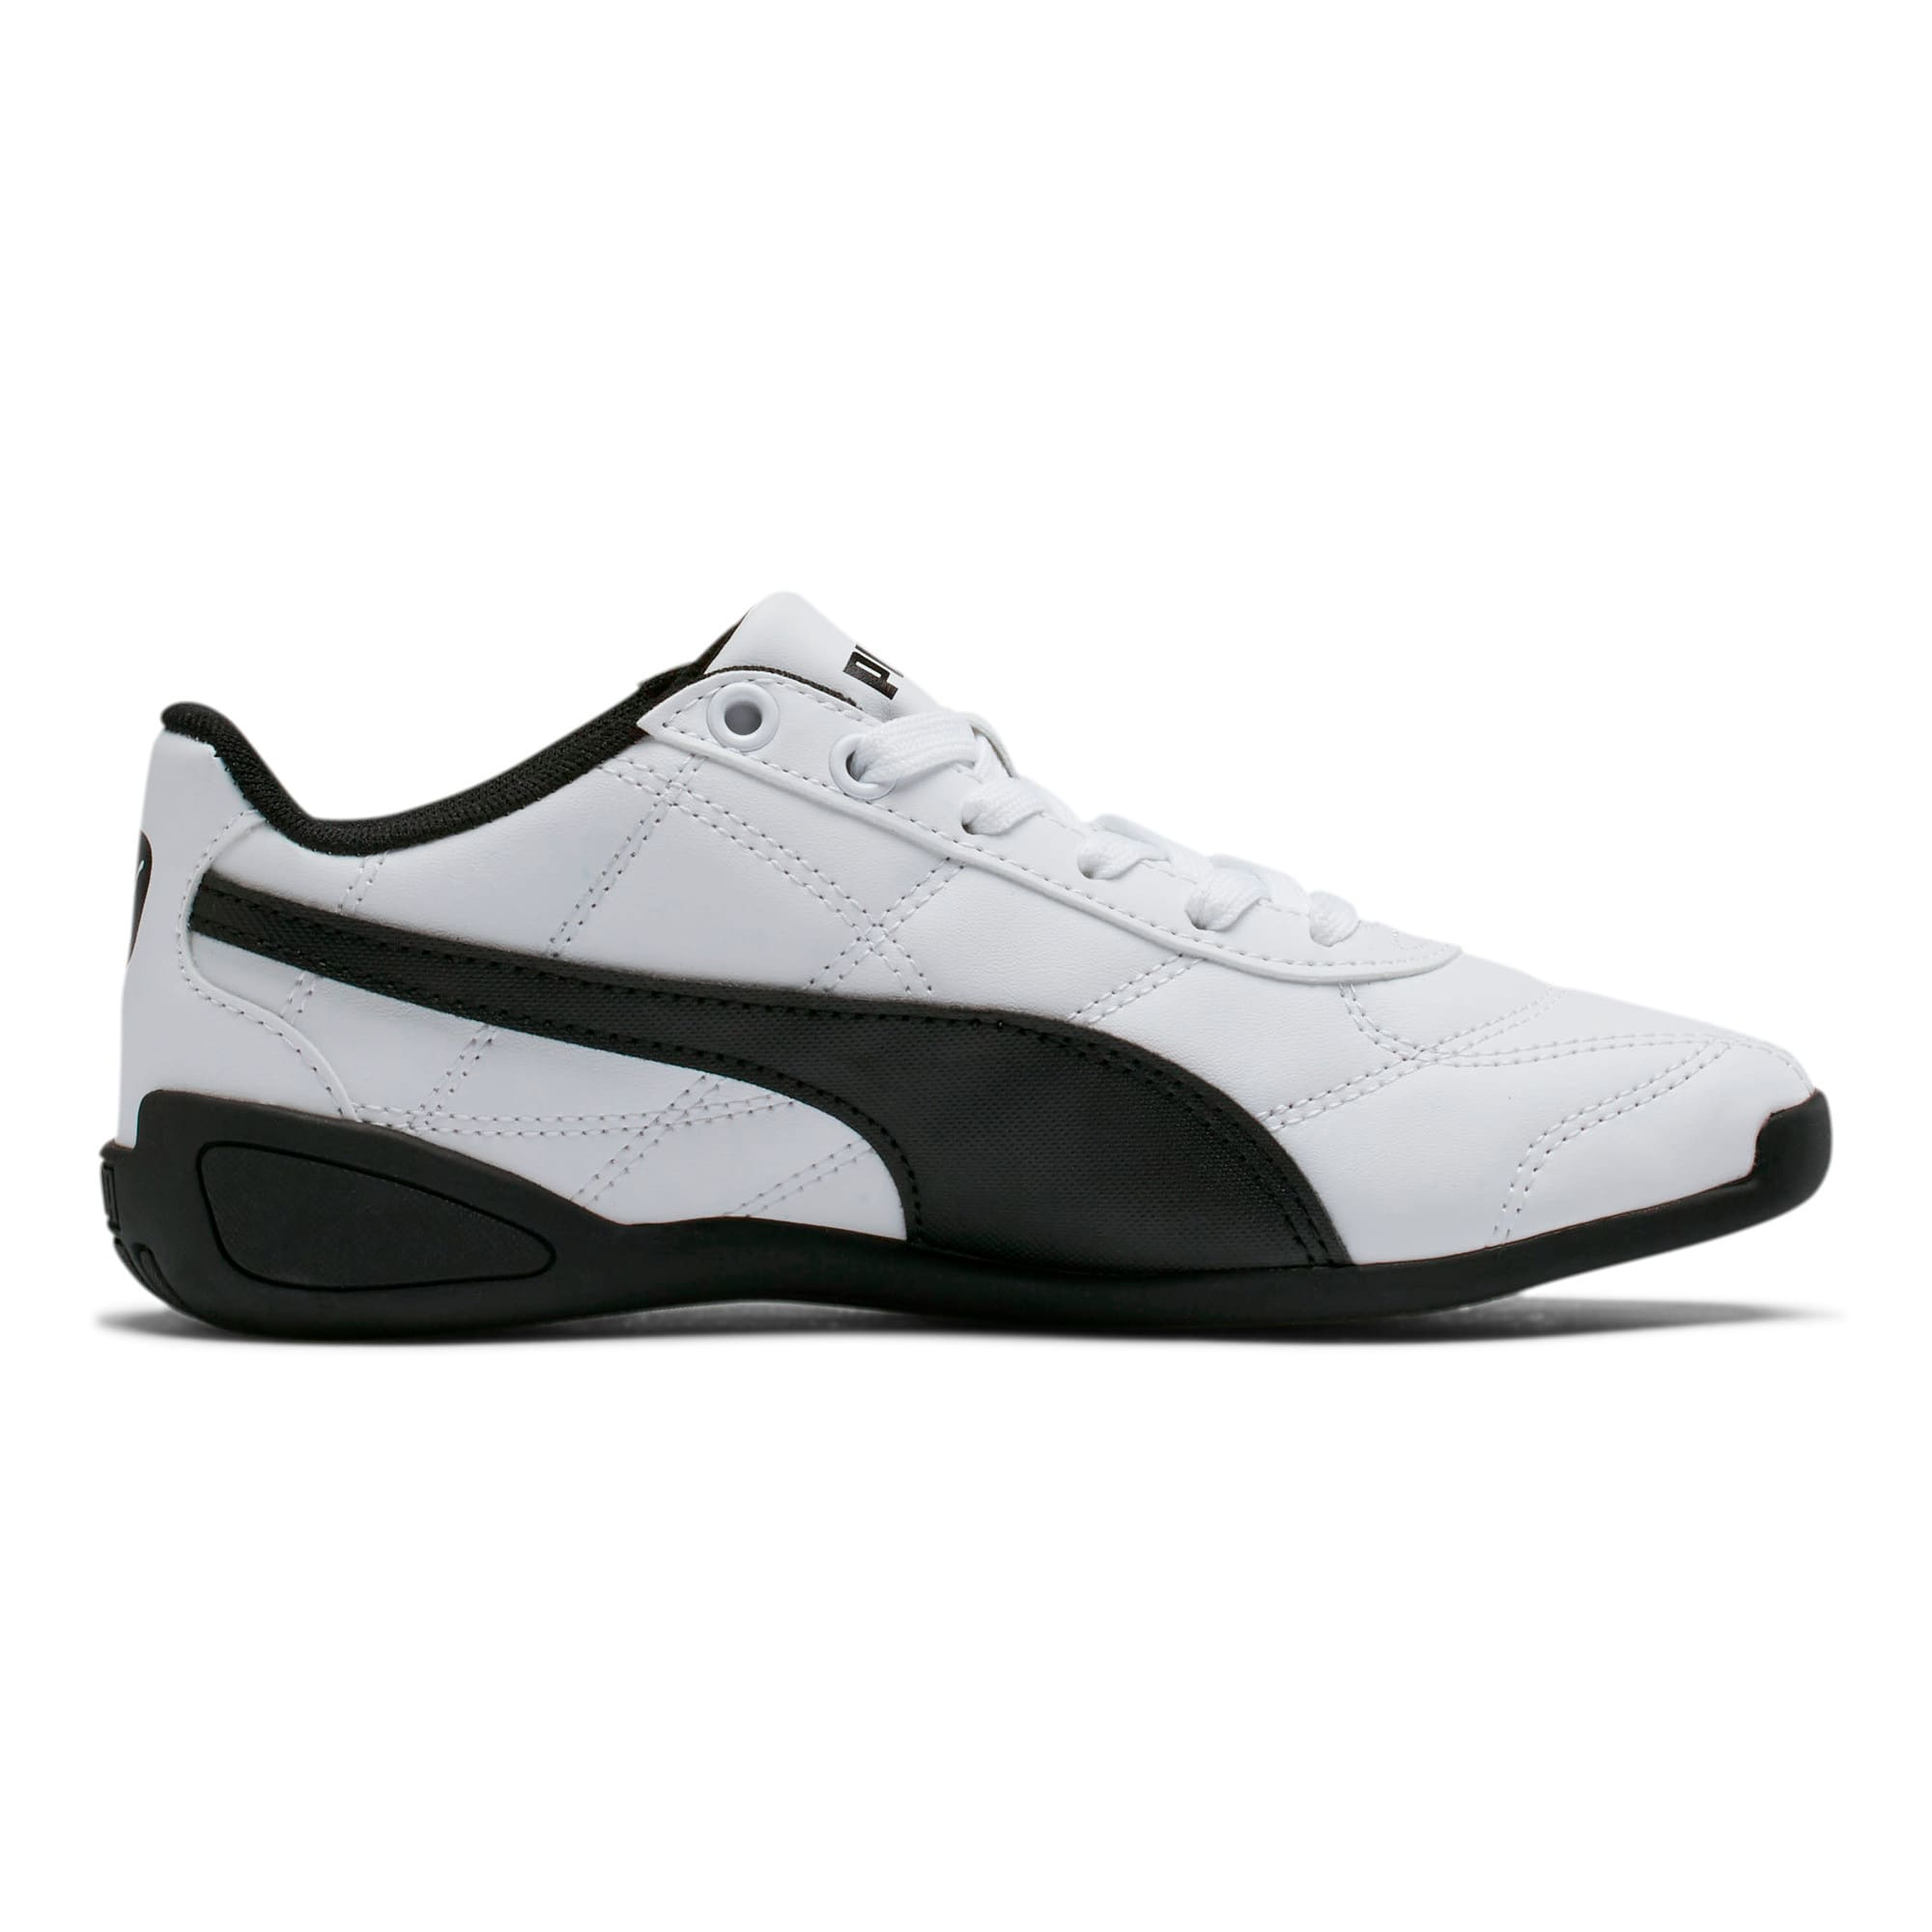 Thumbnail 5 of Tune Cat 3 Shoes JR, Puma White-Puma Black, medium